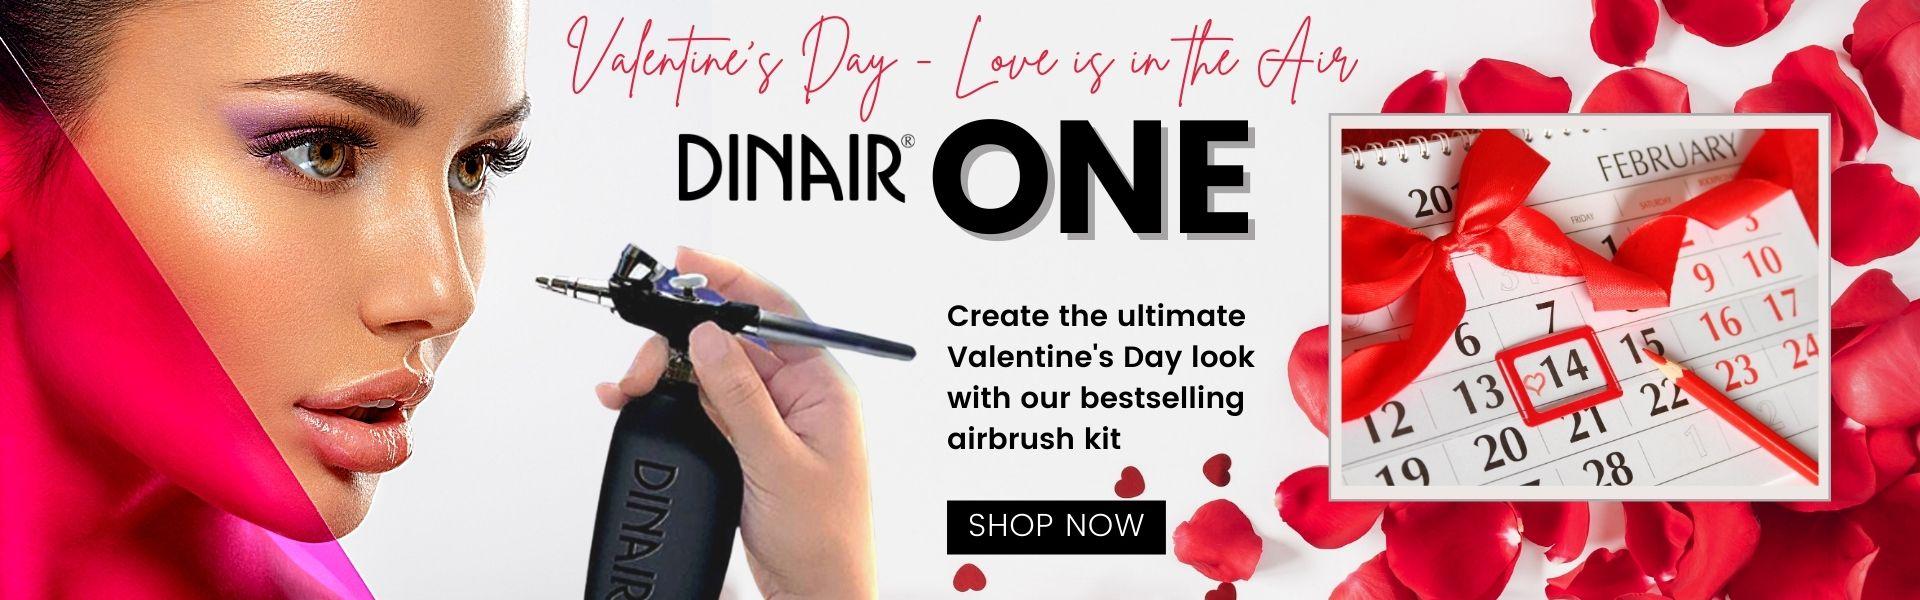 Valentine2 - Dinair One